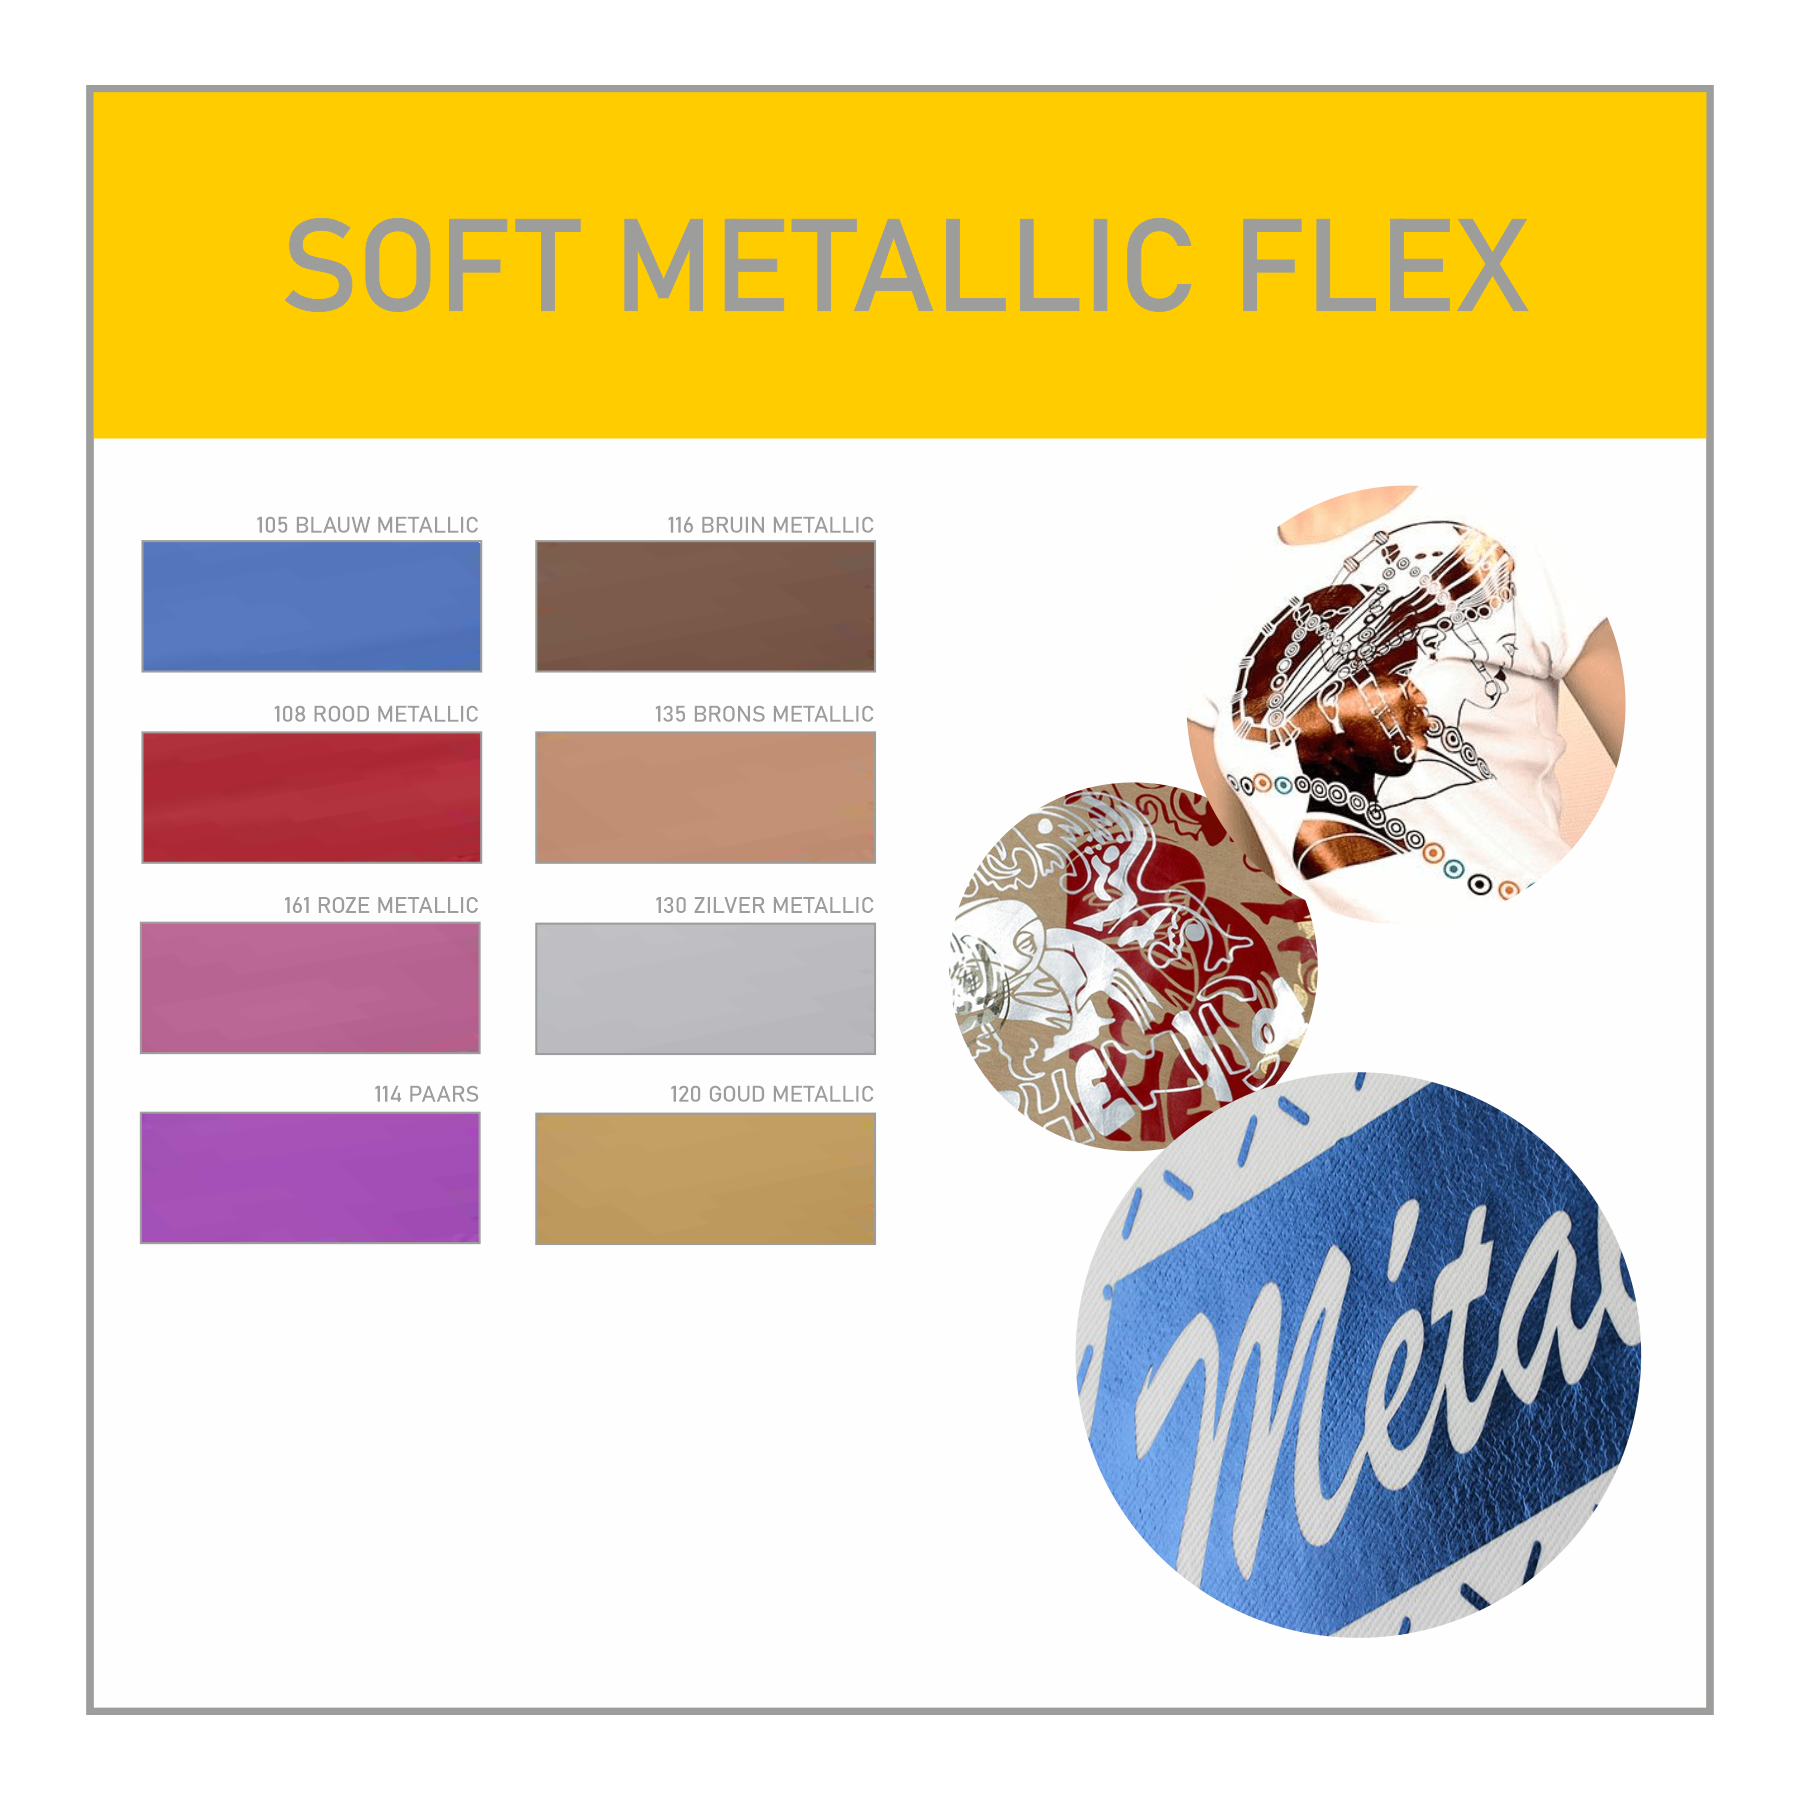 Soft Metallic Flex